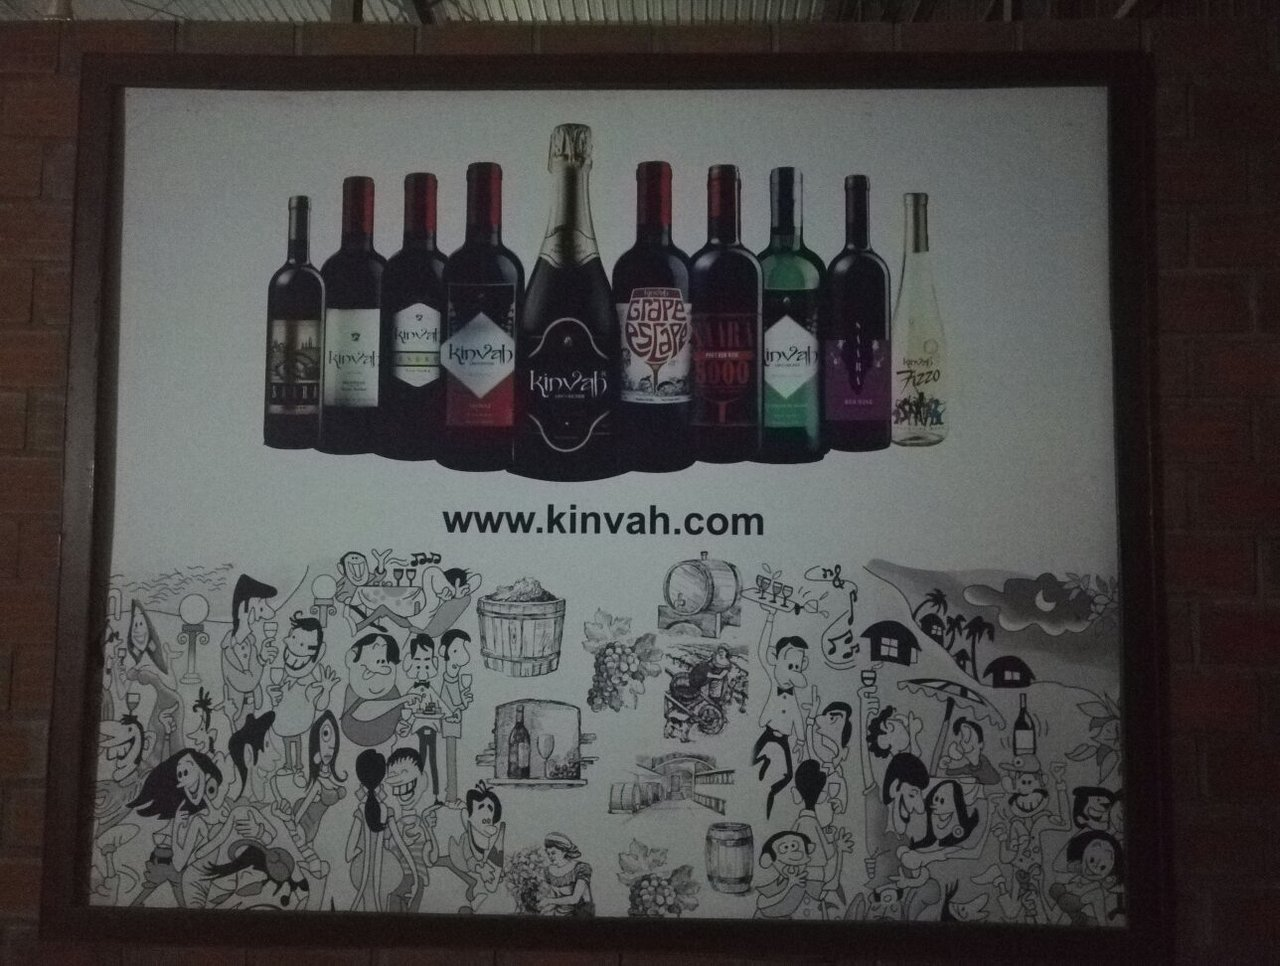 Kinvah Vineyards Bengaluru 2019 What to Know Before You